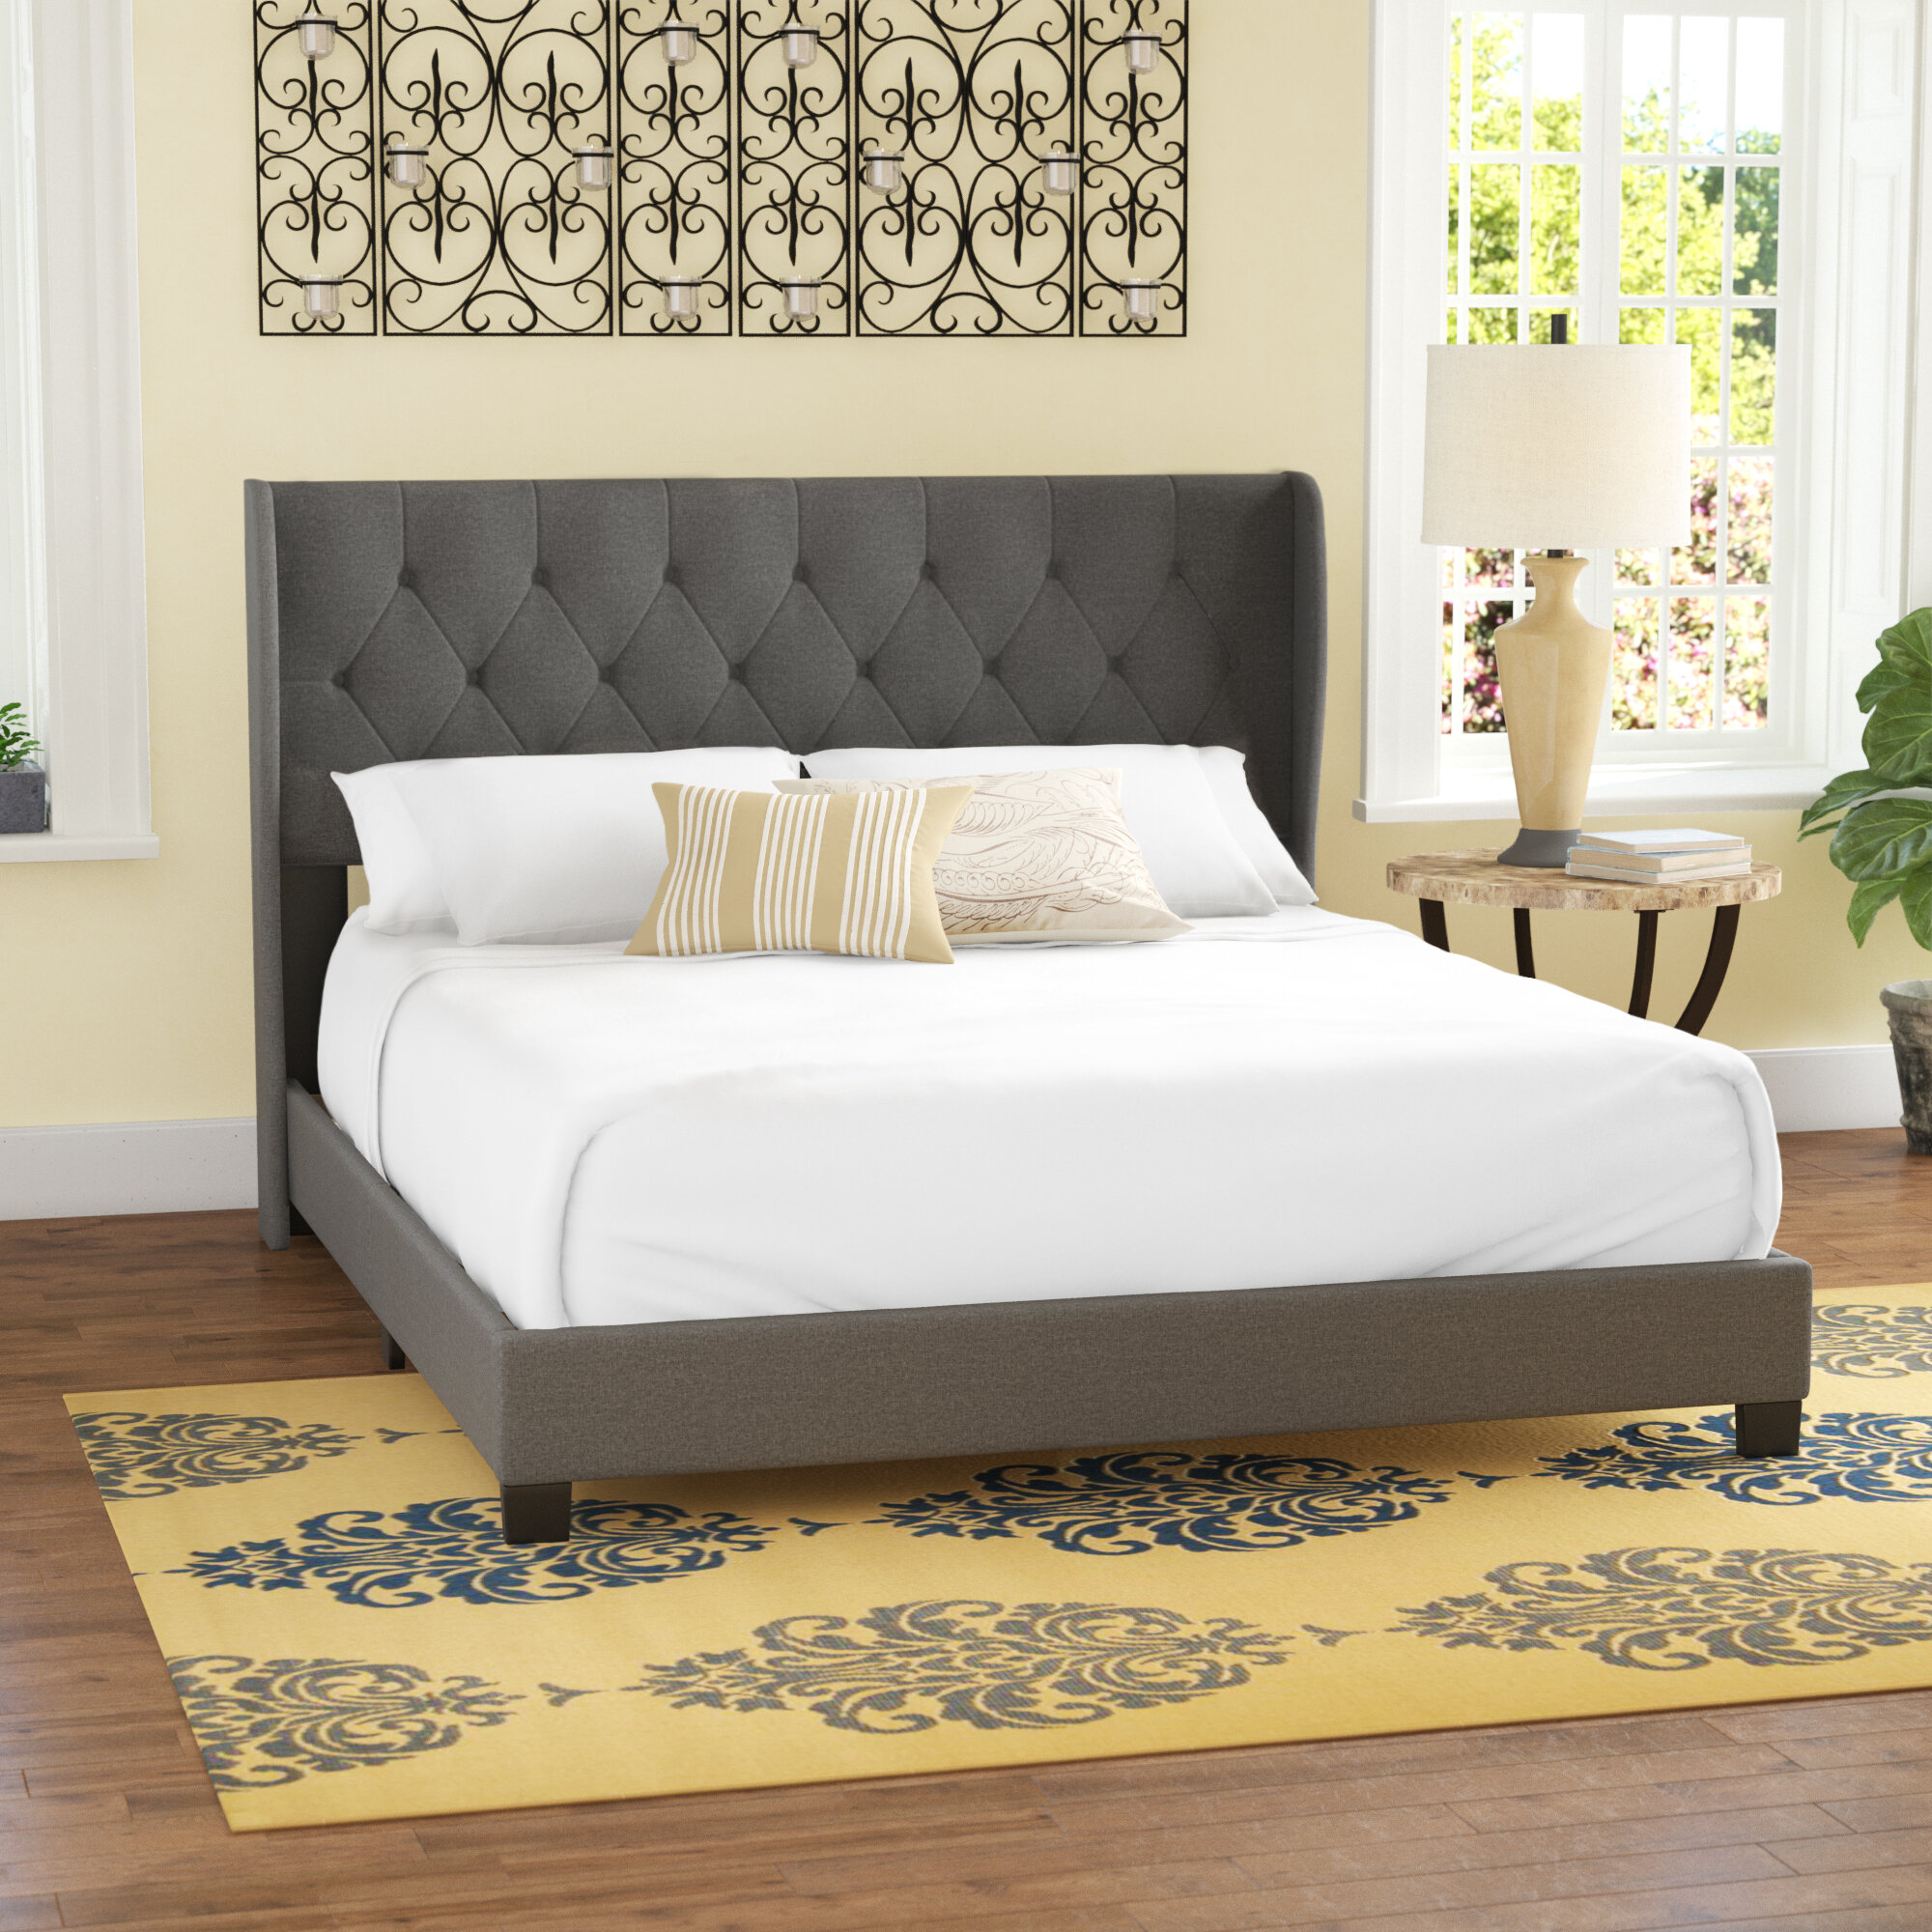 Baremeadow Queen Upholstered Standard Bed